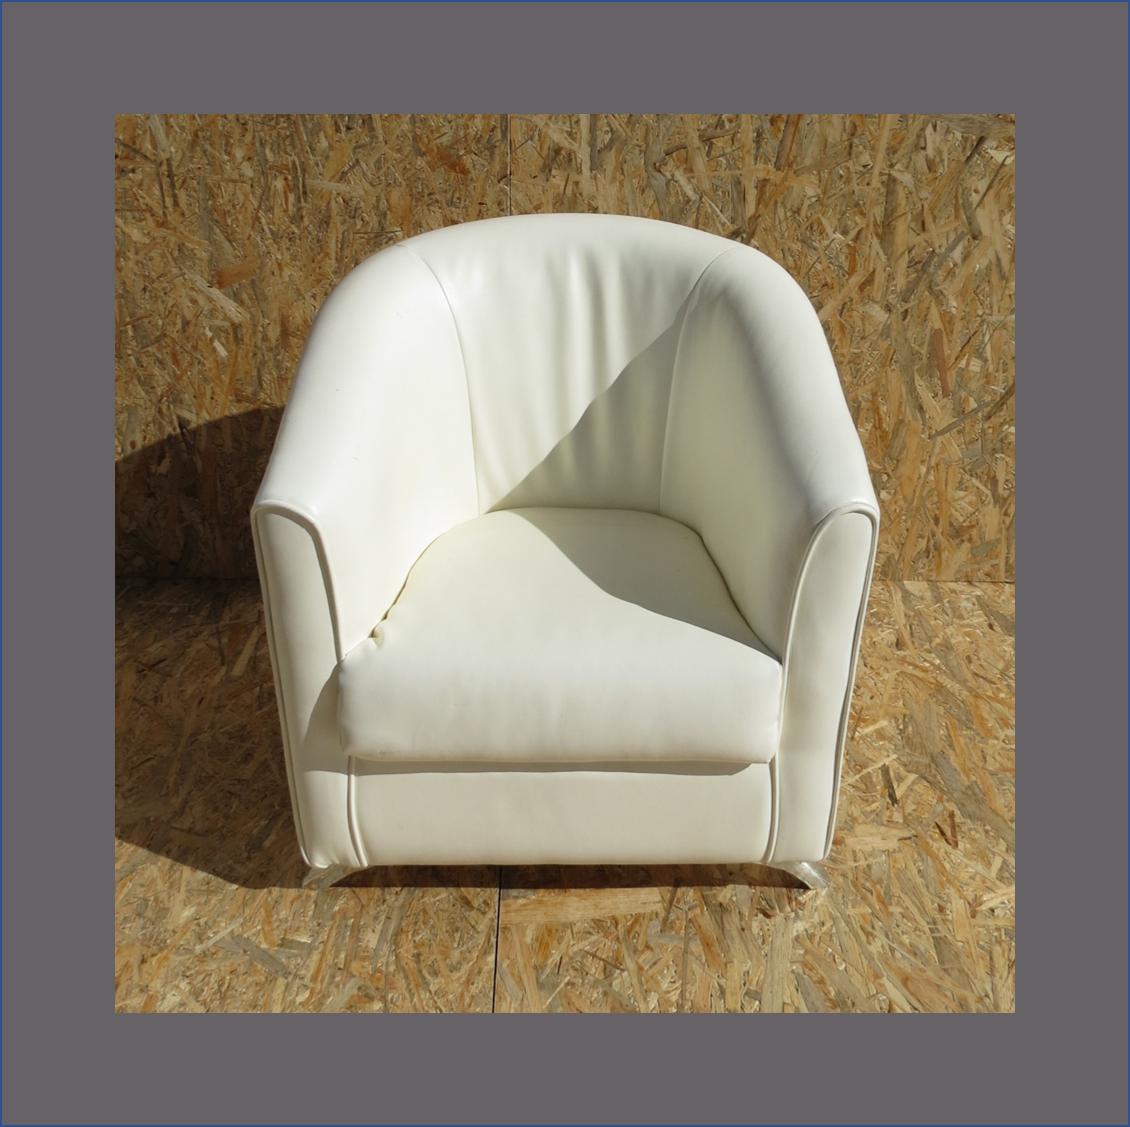 white-leather-tub-chair